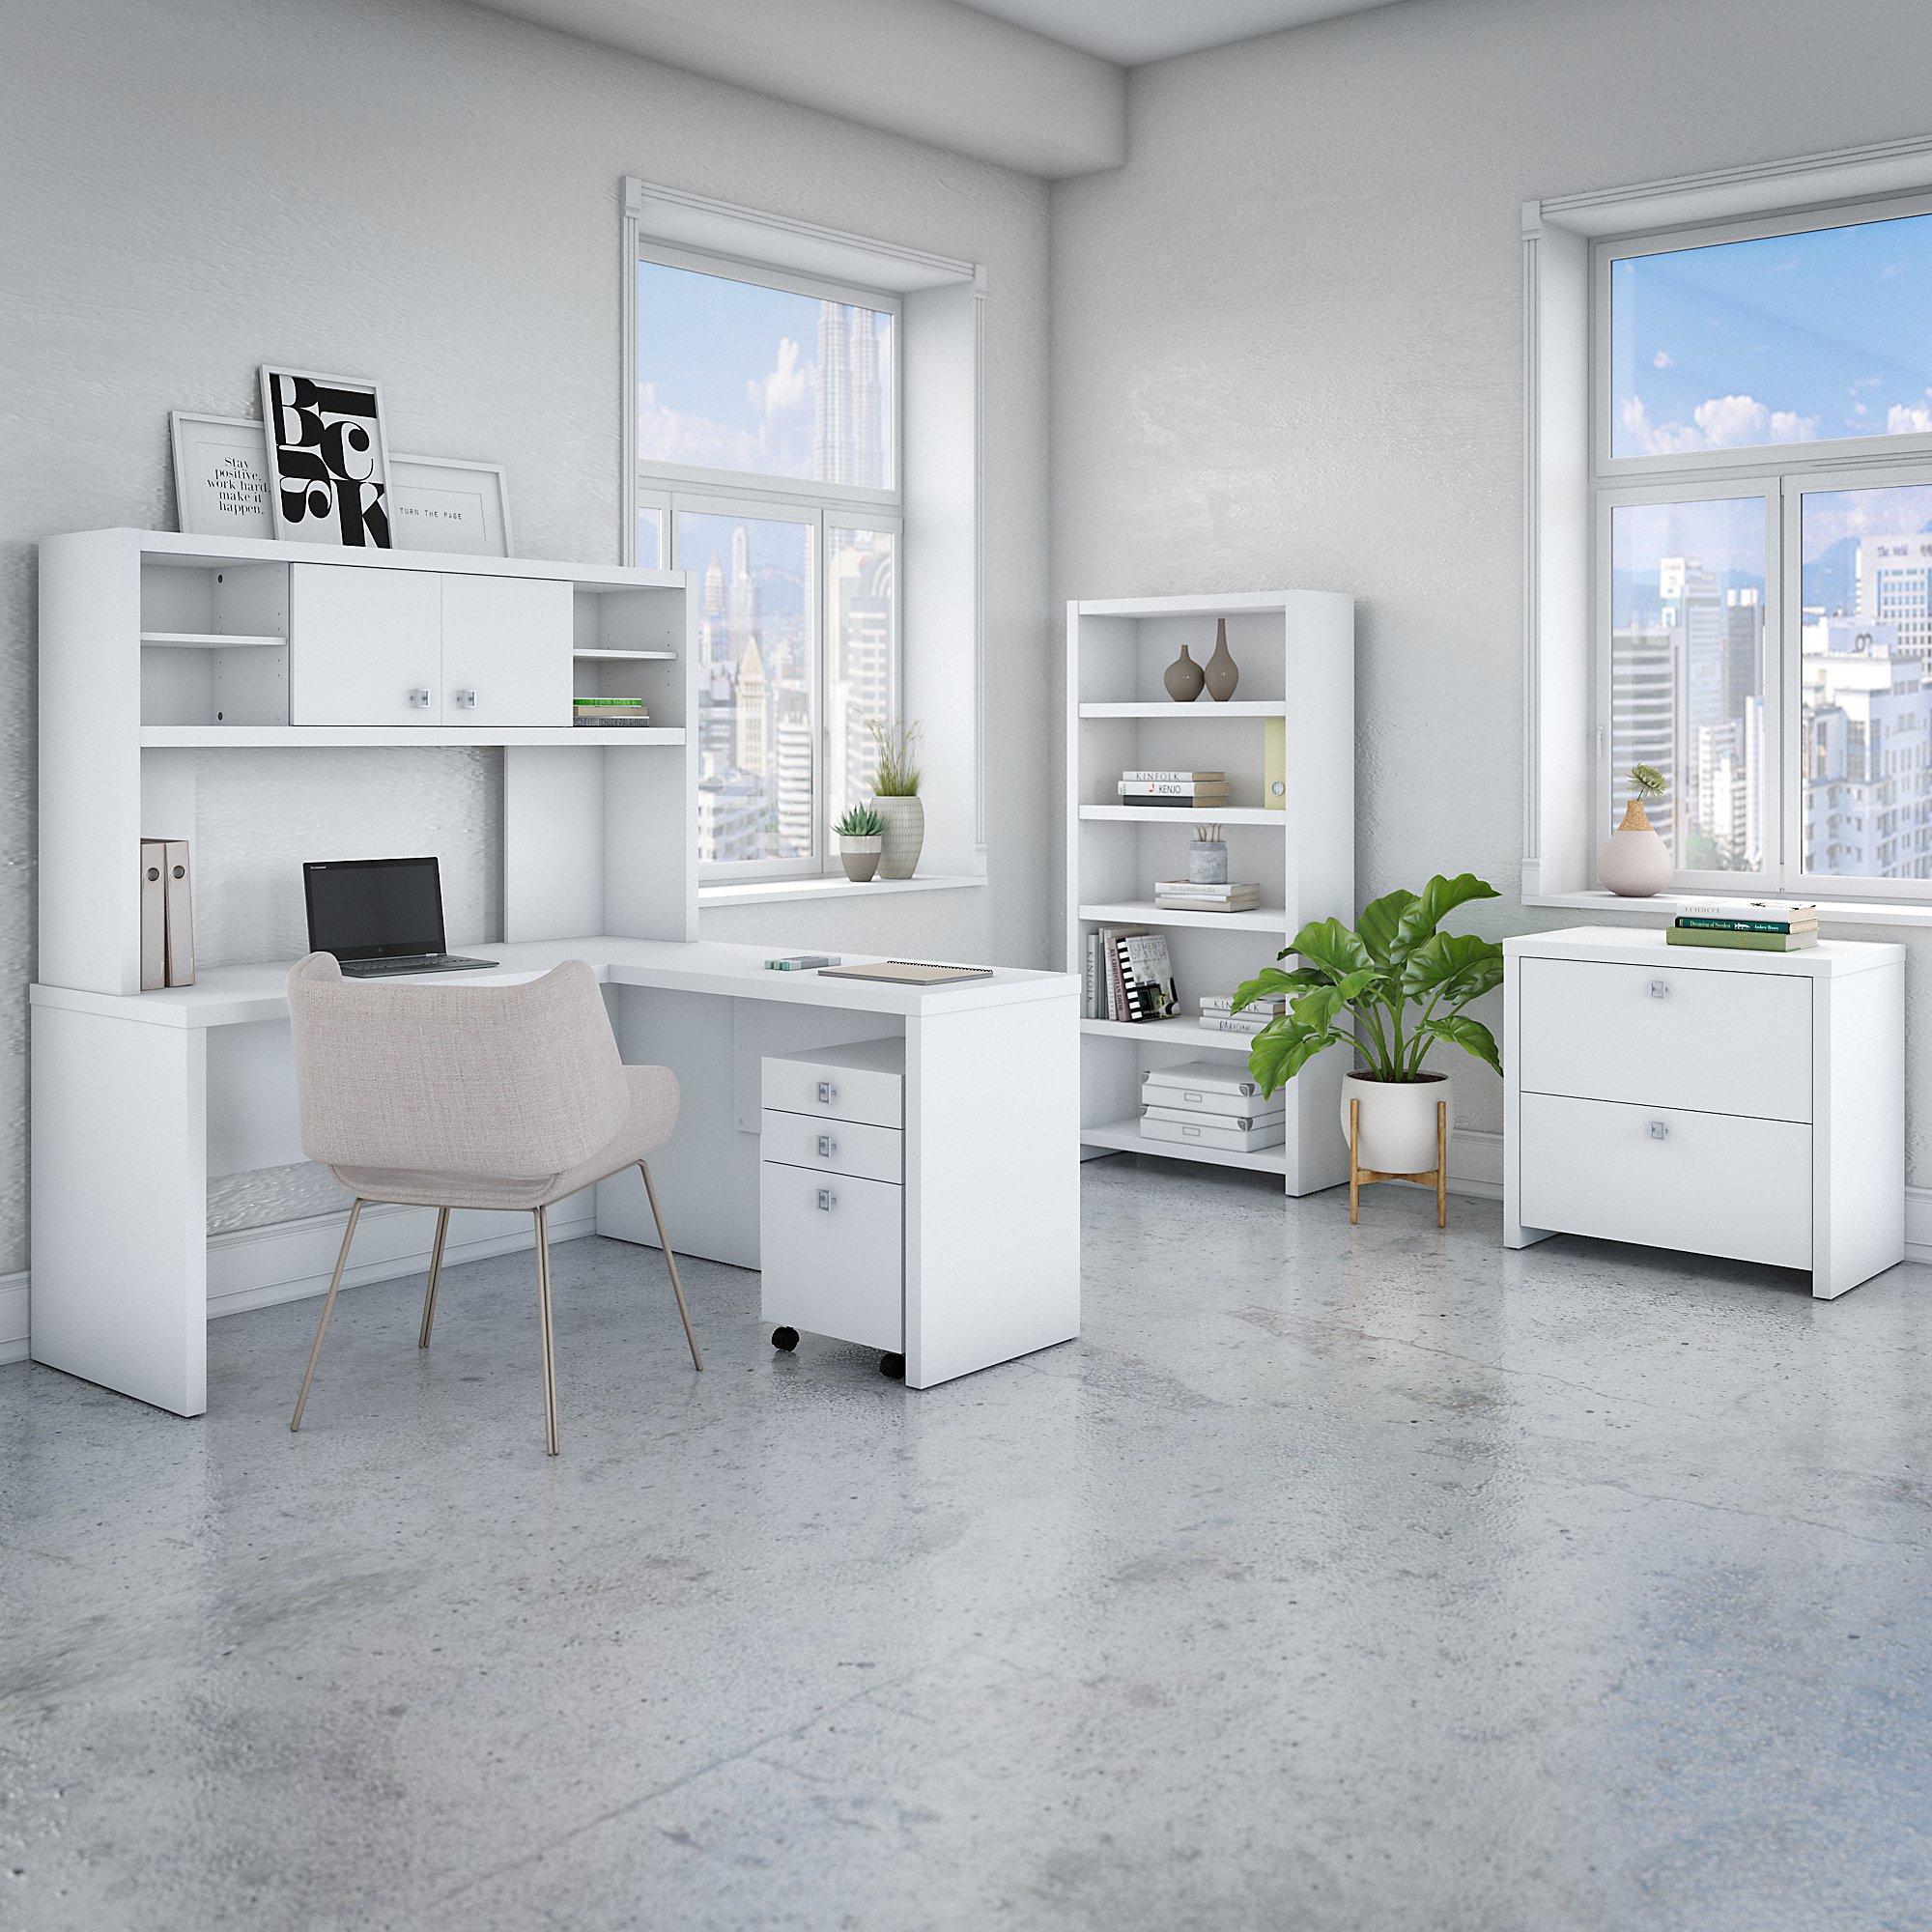 pure white echo executive furniture set